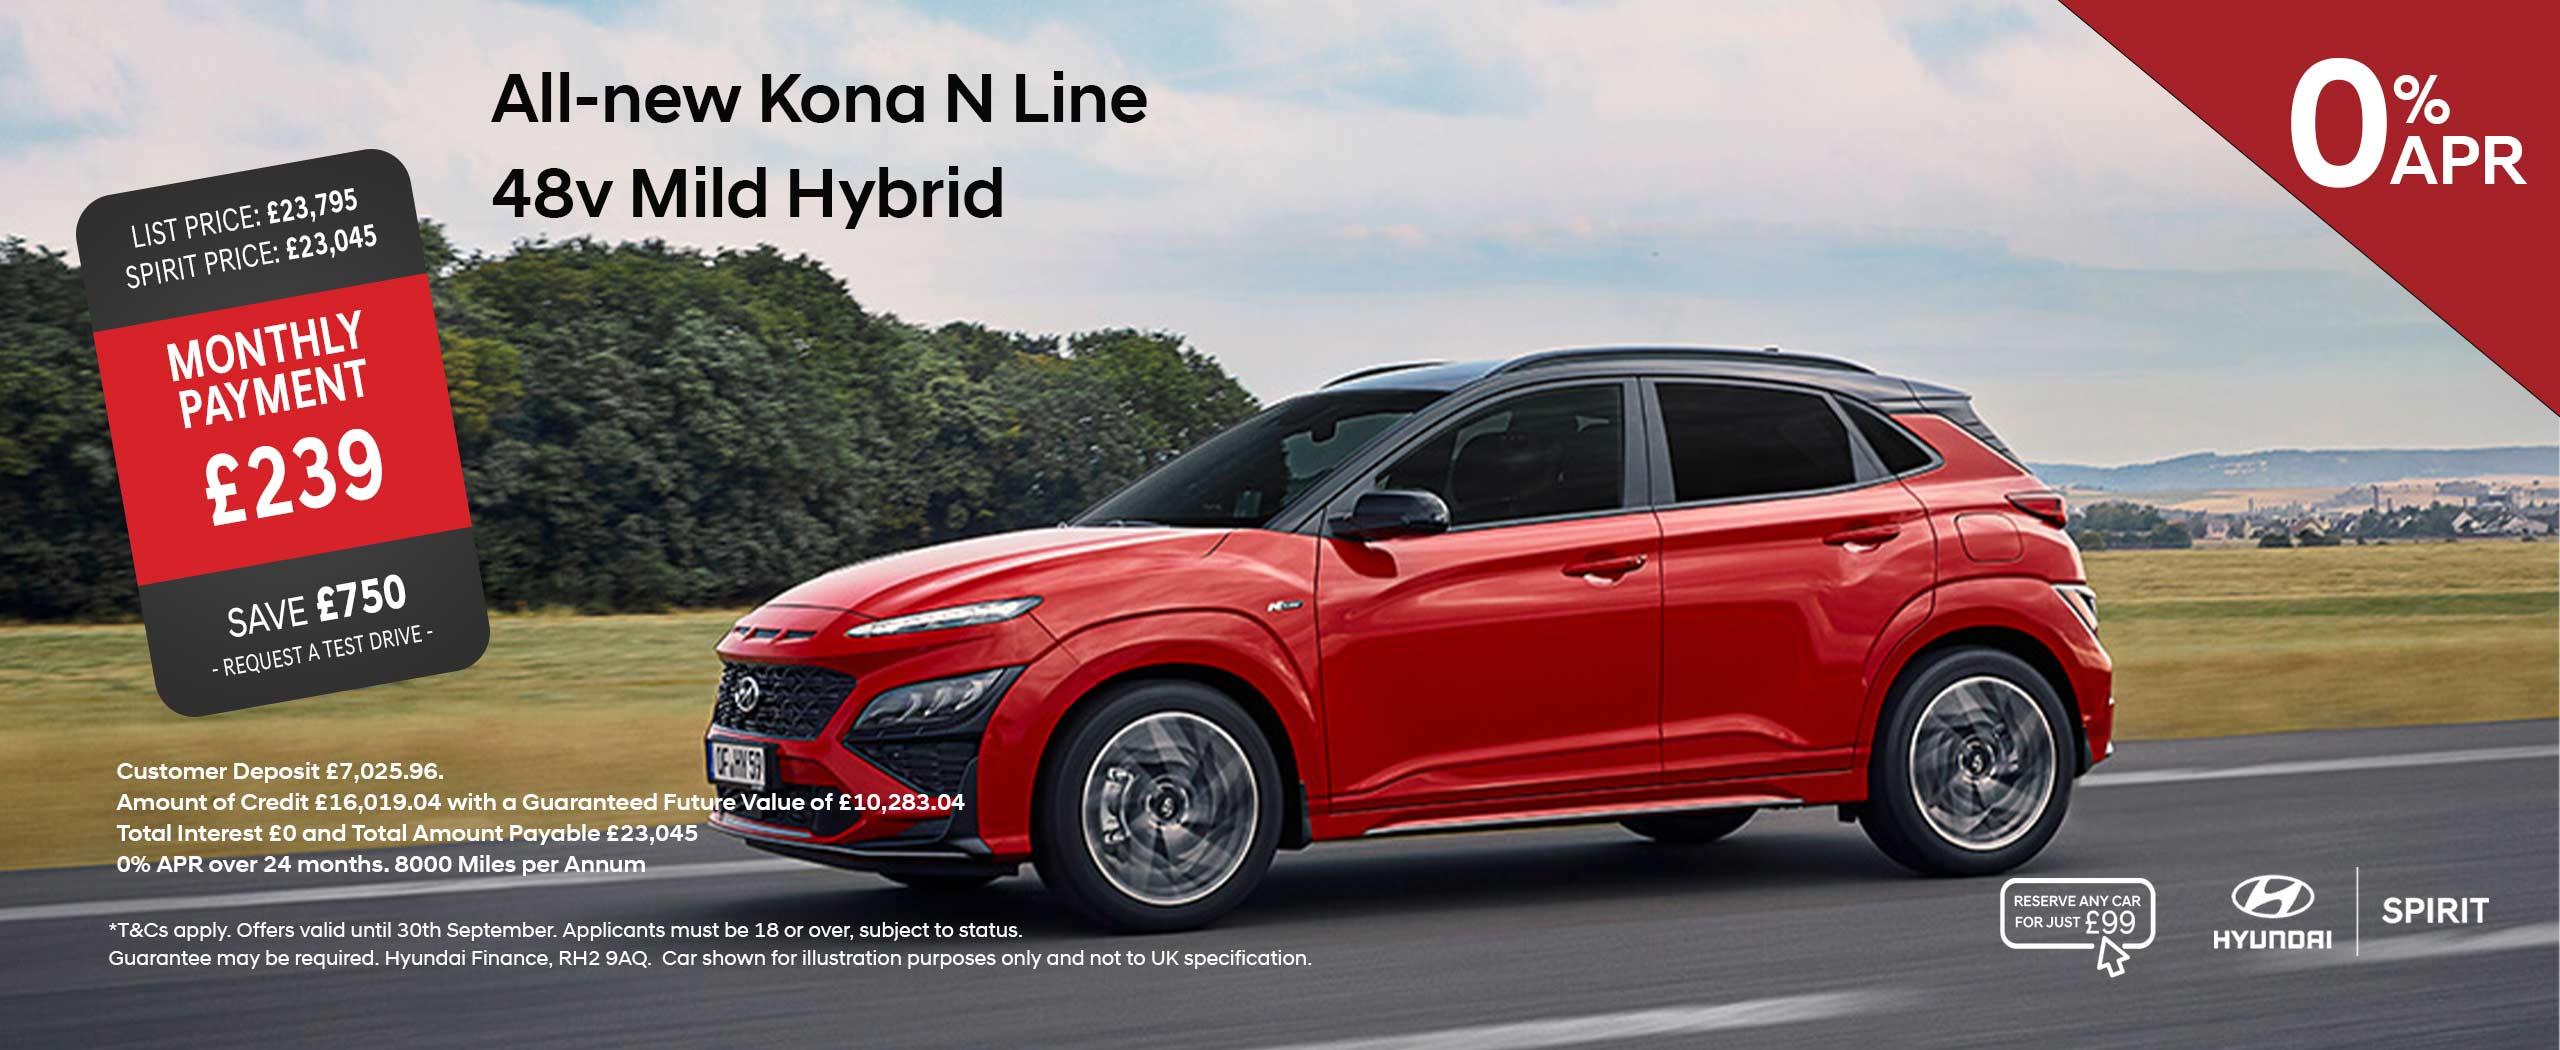 All-New Kona N-Line